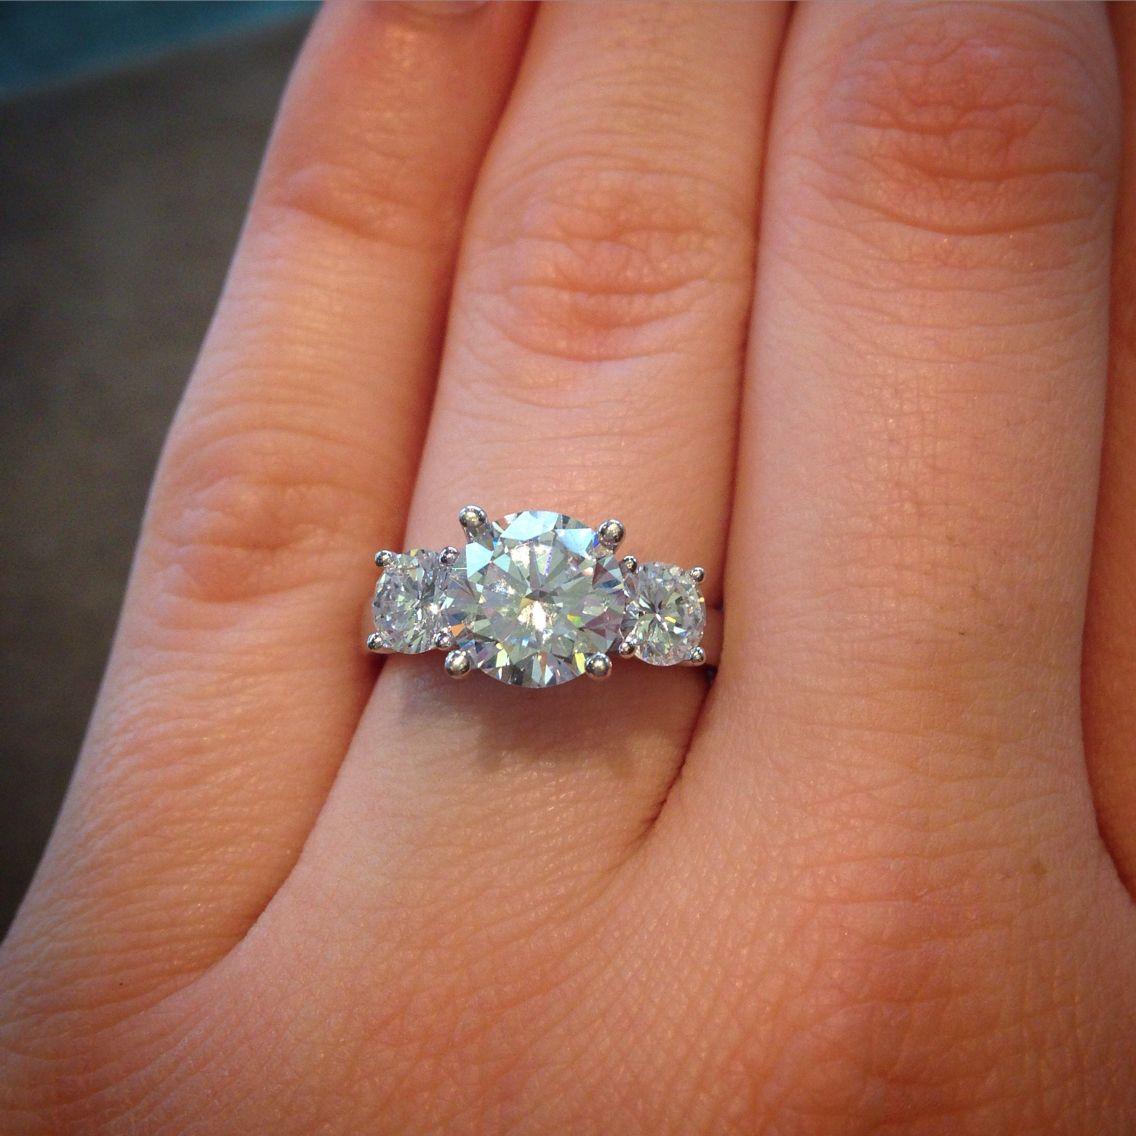 Stunning 3 stone engagement ring. 2 carat round center stone eb40404dec2c